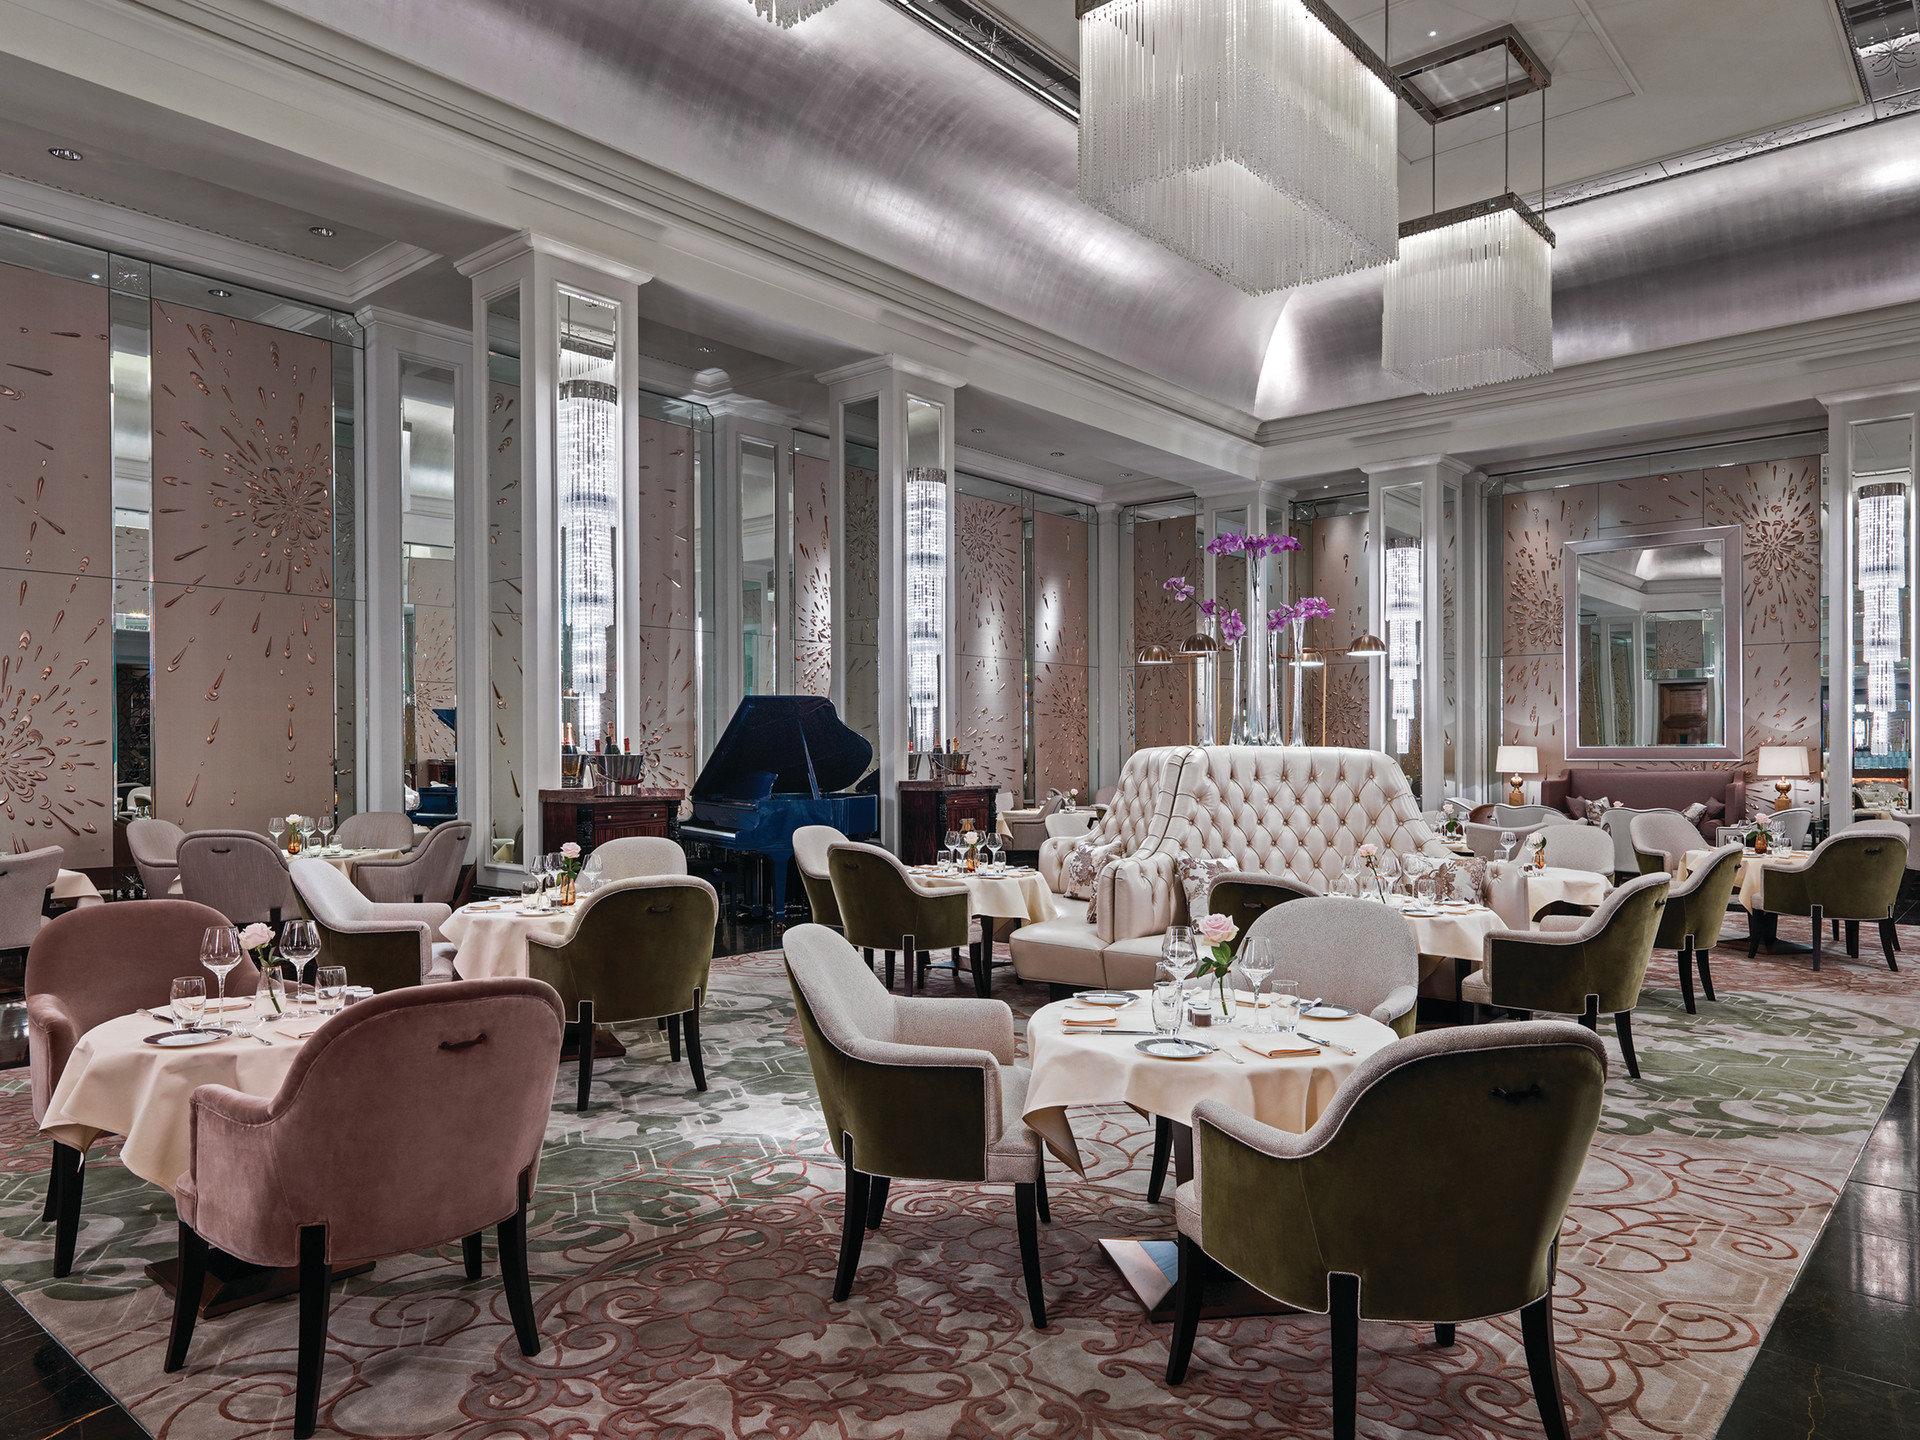 Hotels London Luxury Travel indoor floor window chair room restaurant interior design estate function hall meal dining room furniture Lobby living room Design ballroom several